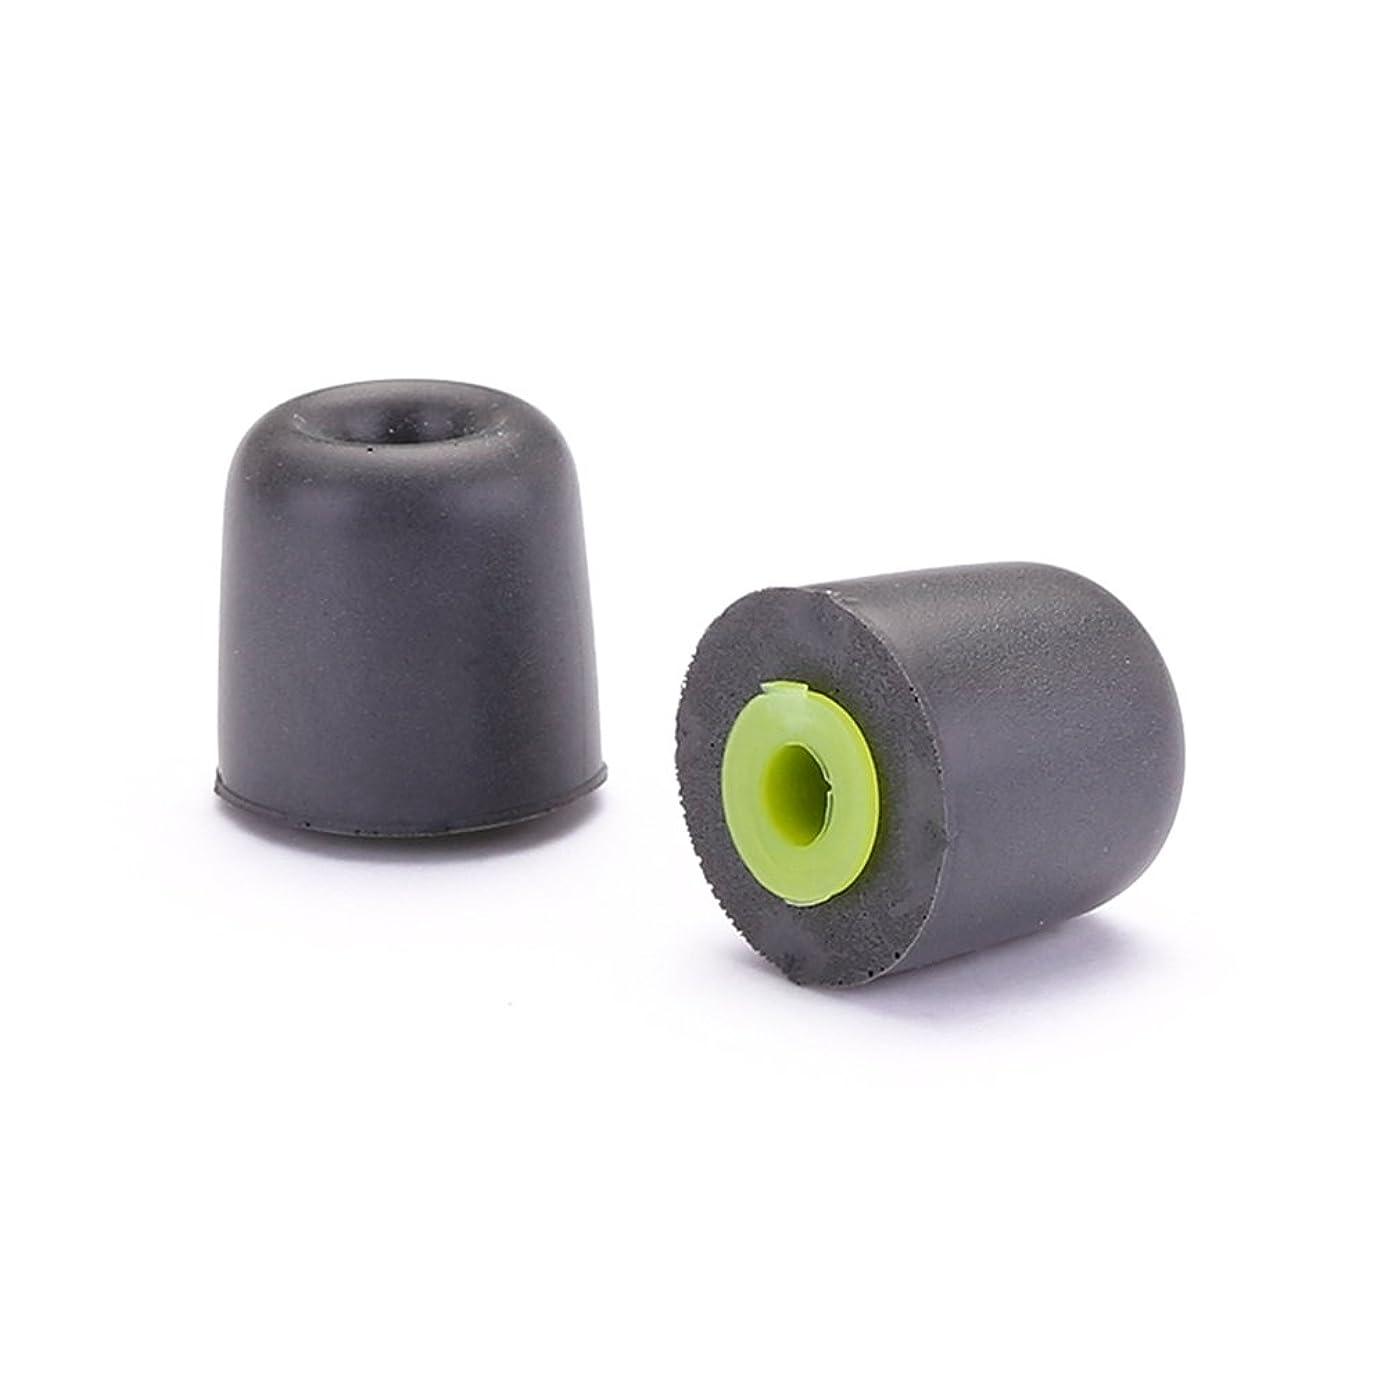 Westone True-Fit Foam Replacement Eartips - 5 Pair Pack, 11mm Diameter X 11mm Length